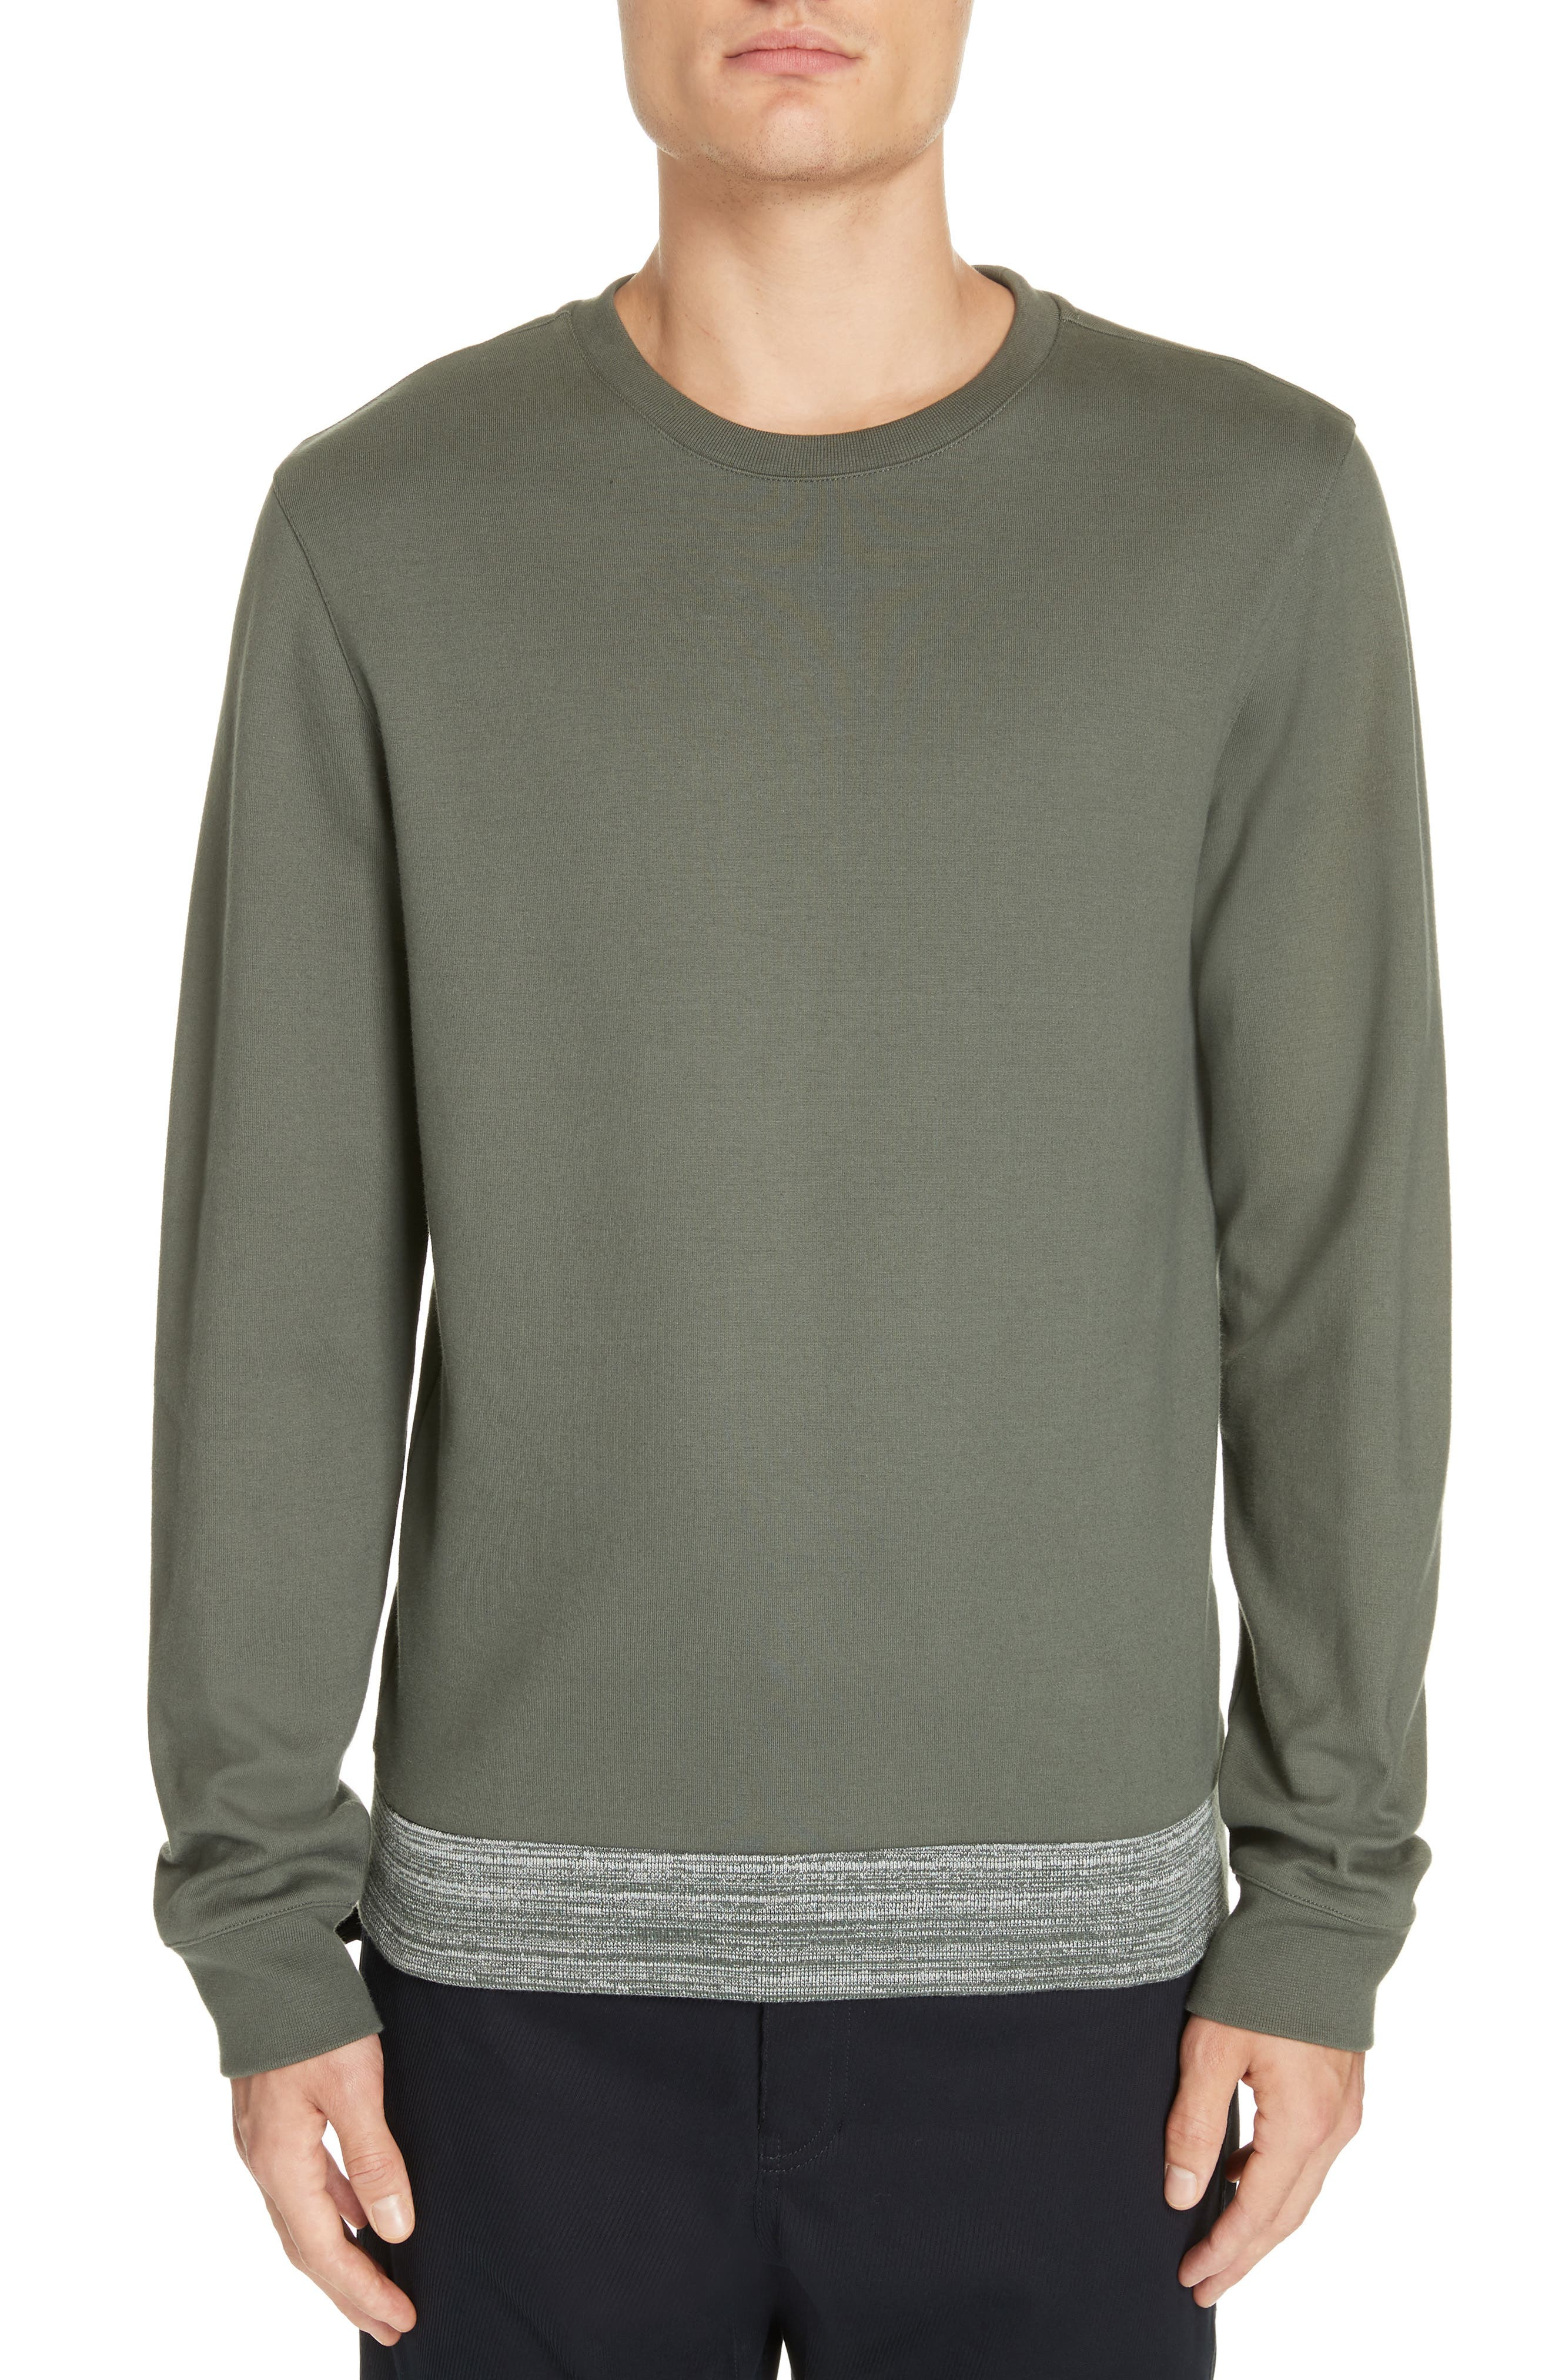 Jeremie Space Dye Sweatshirt, Main, color, KHAKI